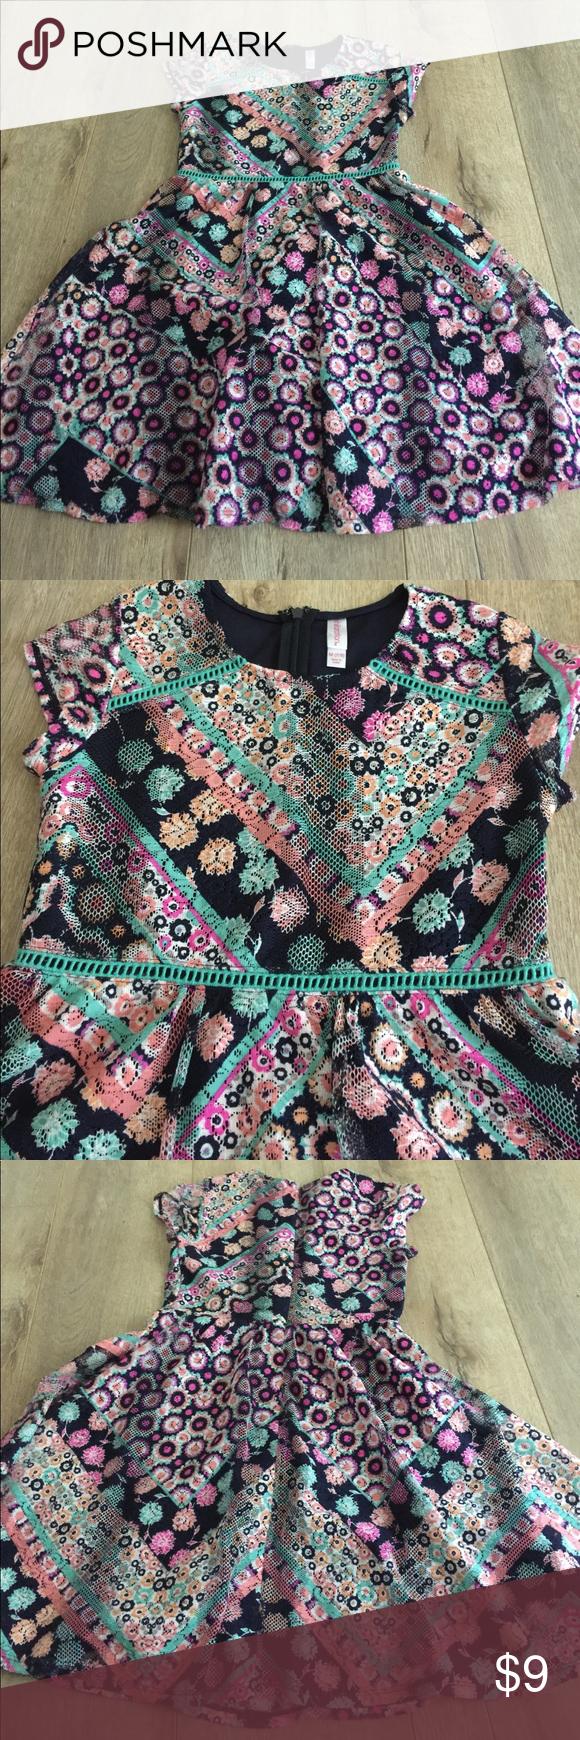 Dress beautiful lace dress for girls colorful and beautiful size